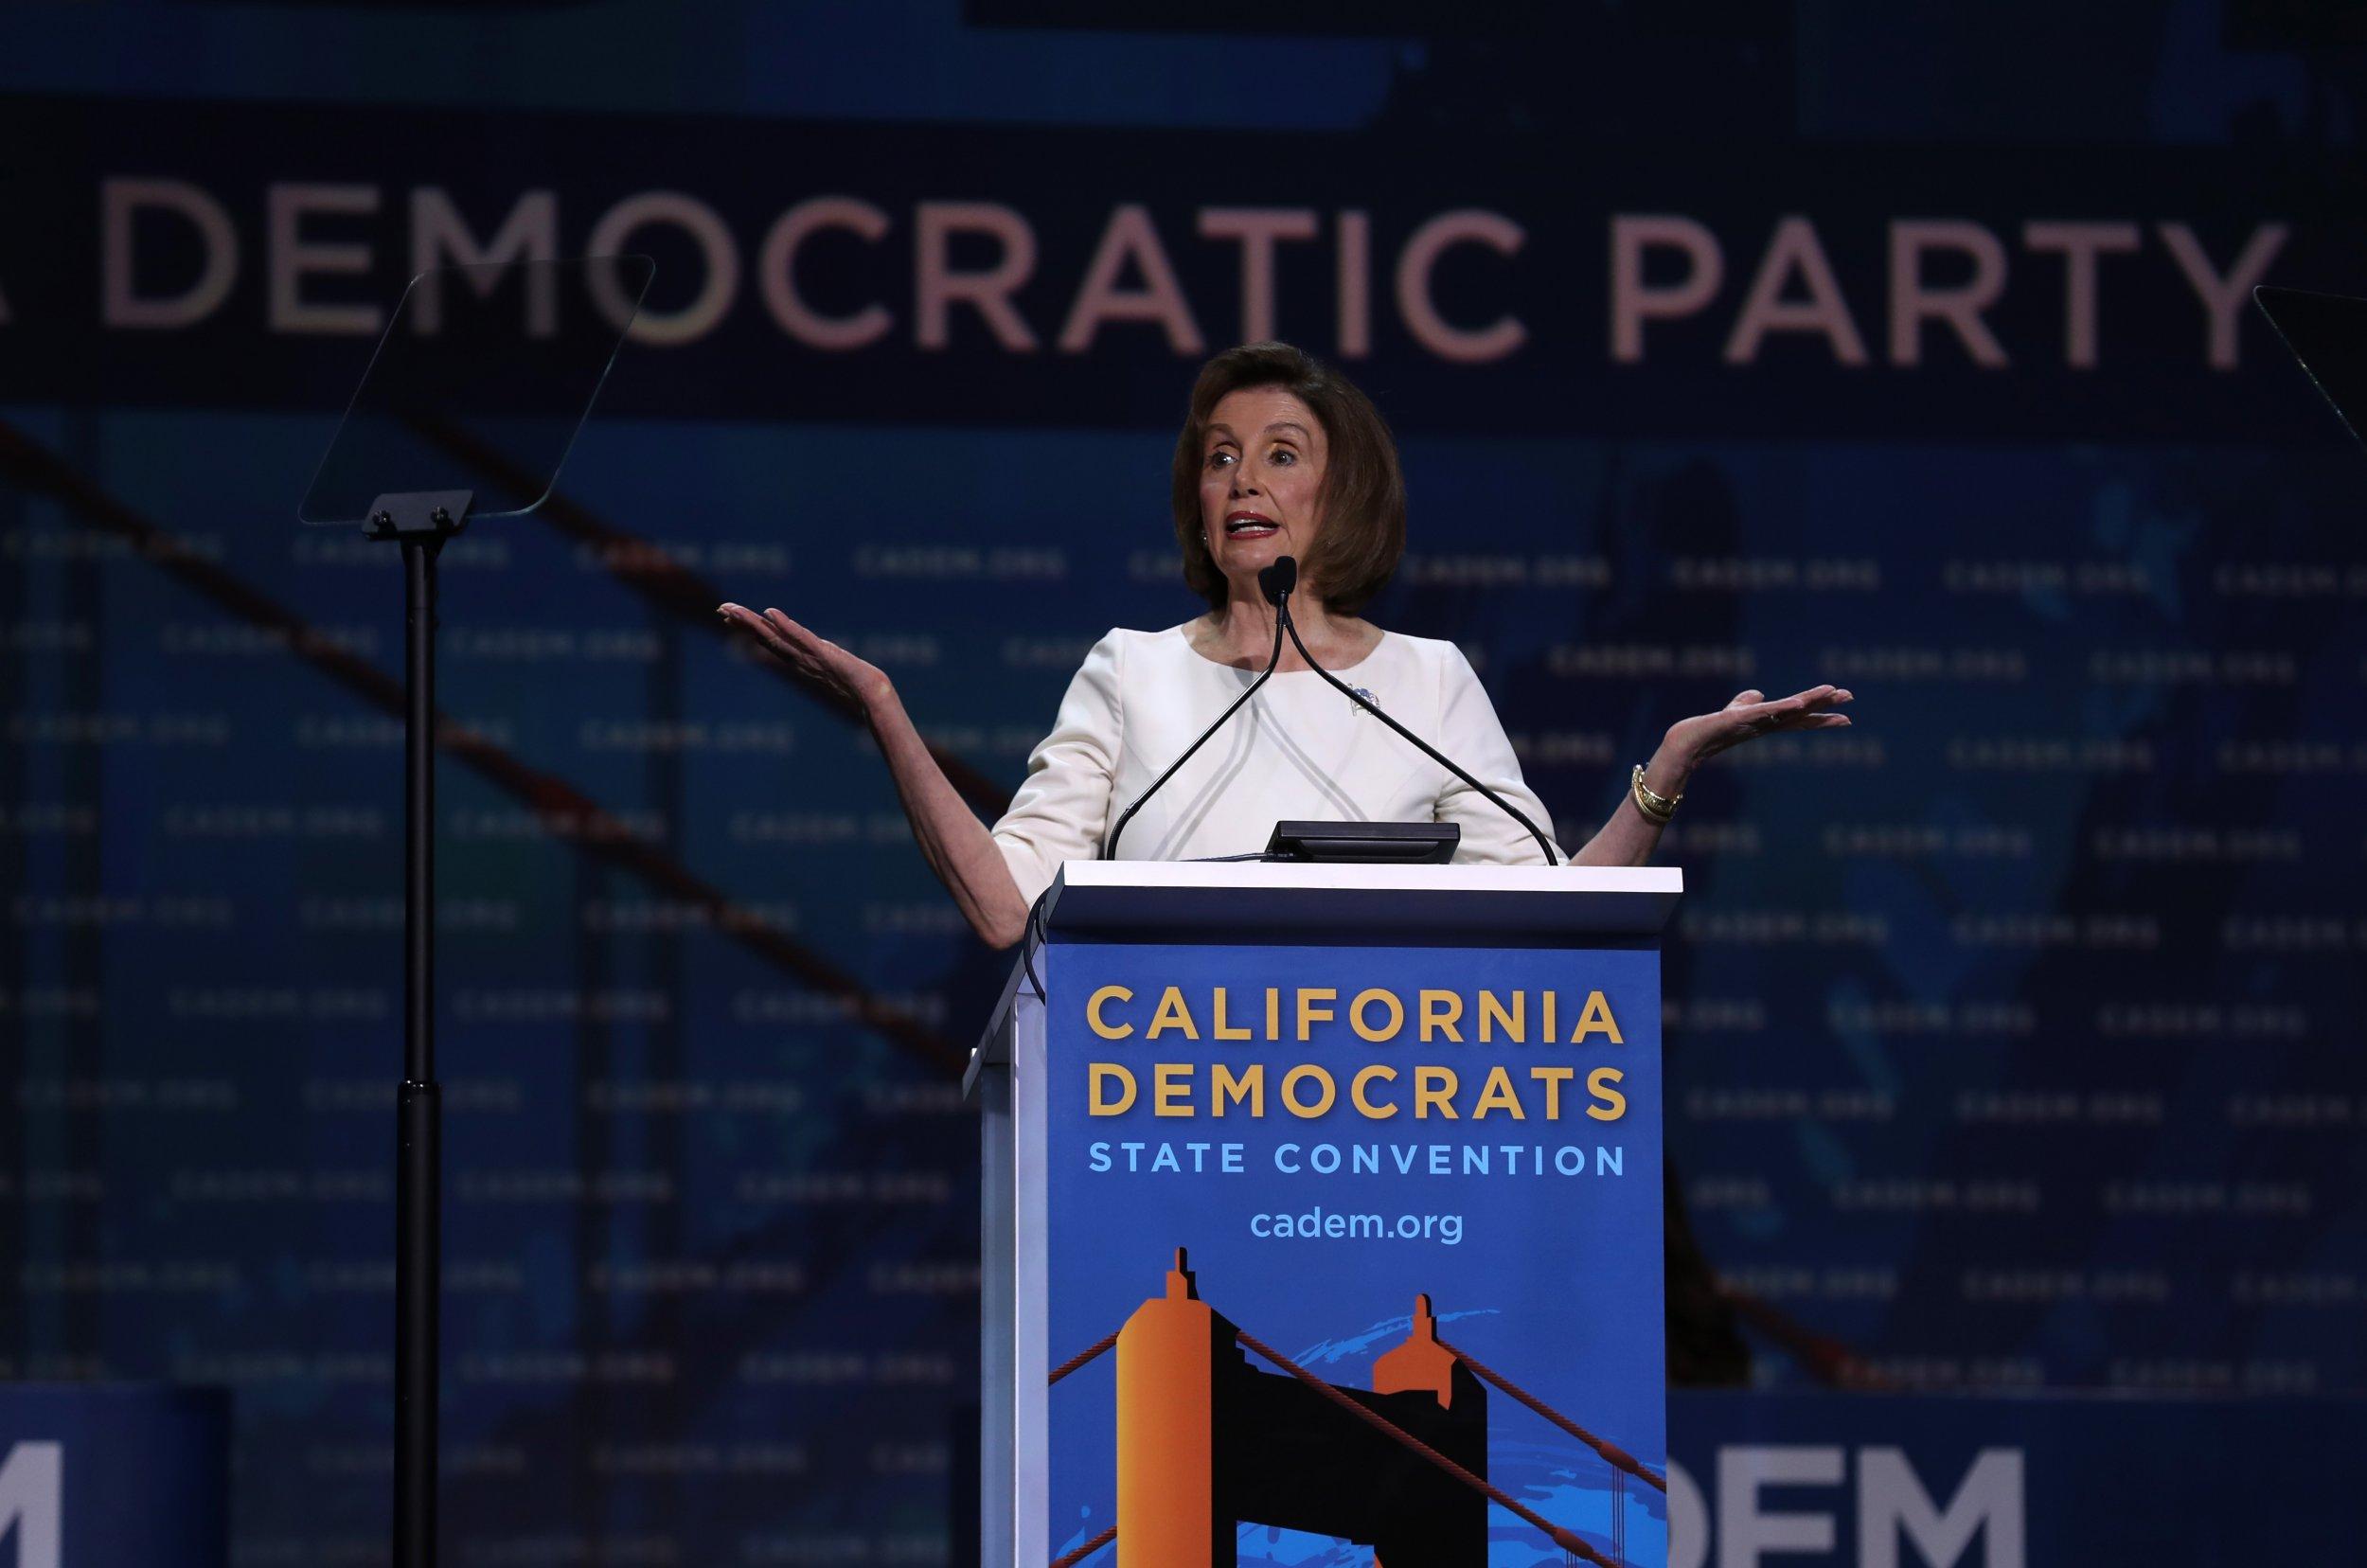 pelosi impeachment california democrats